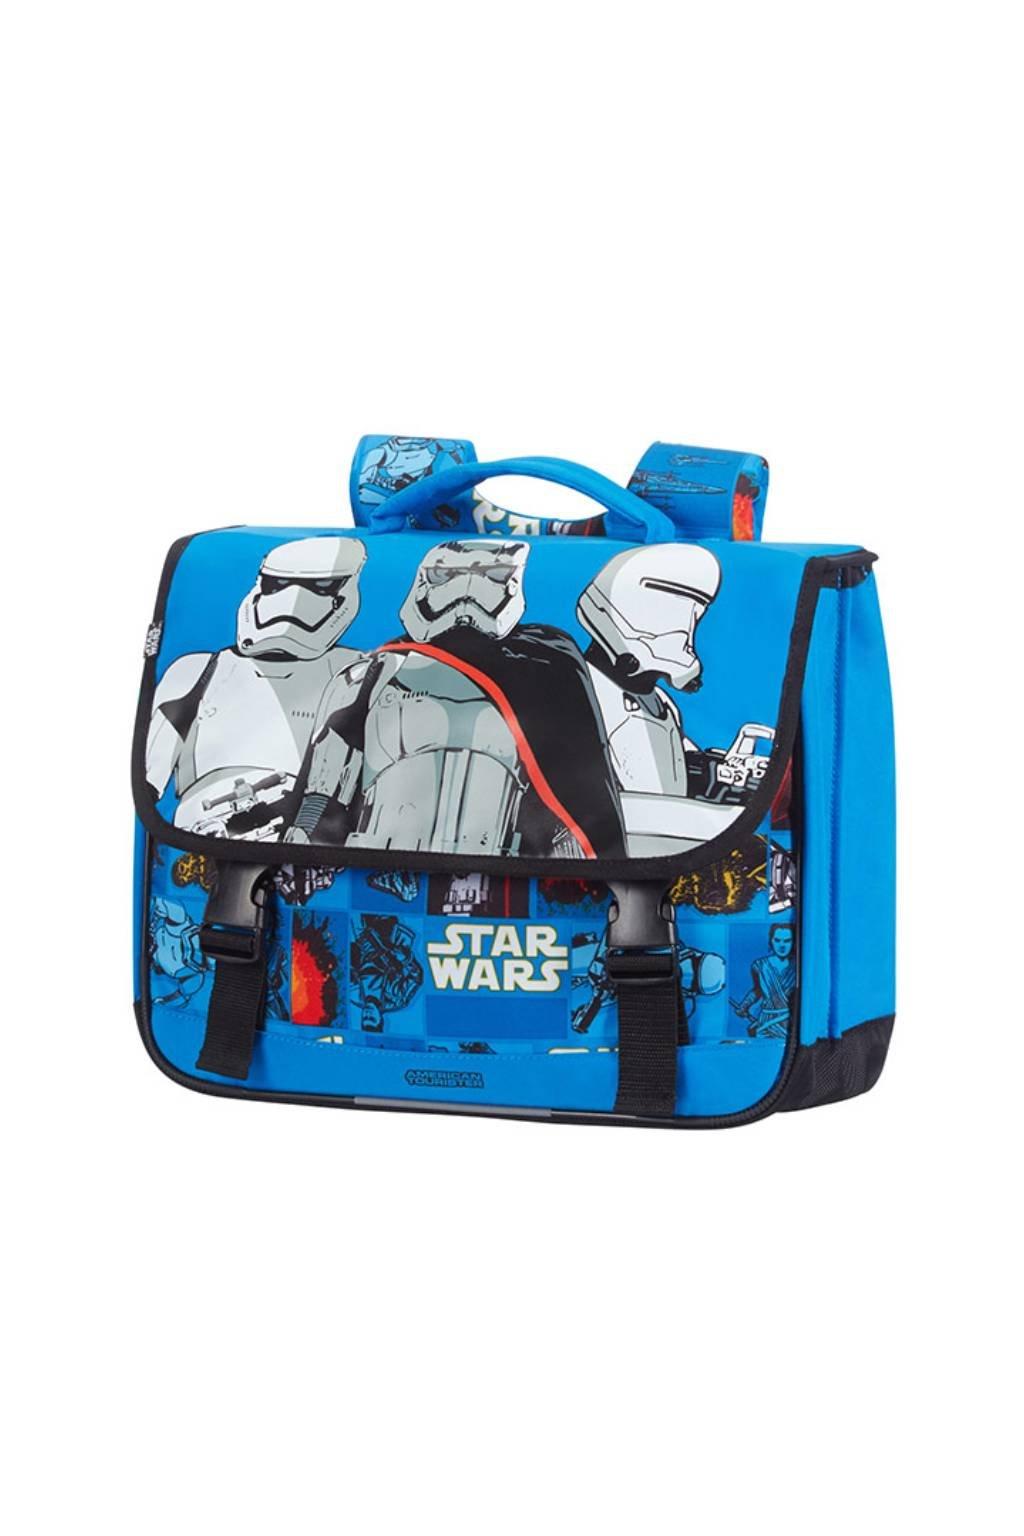 kufrland americantourister newwonder schoolbag starwars blue (1)